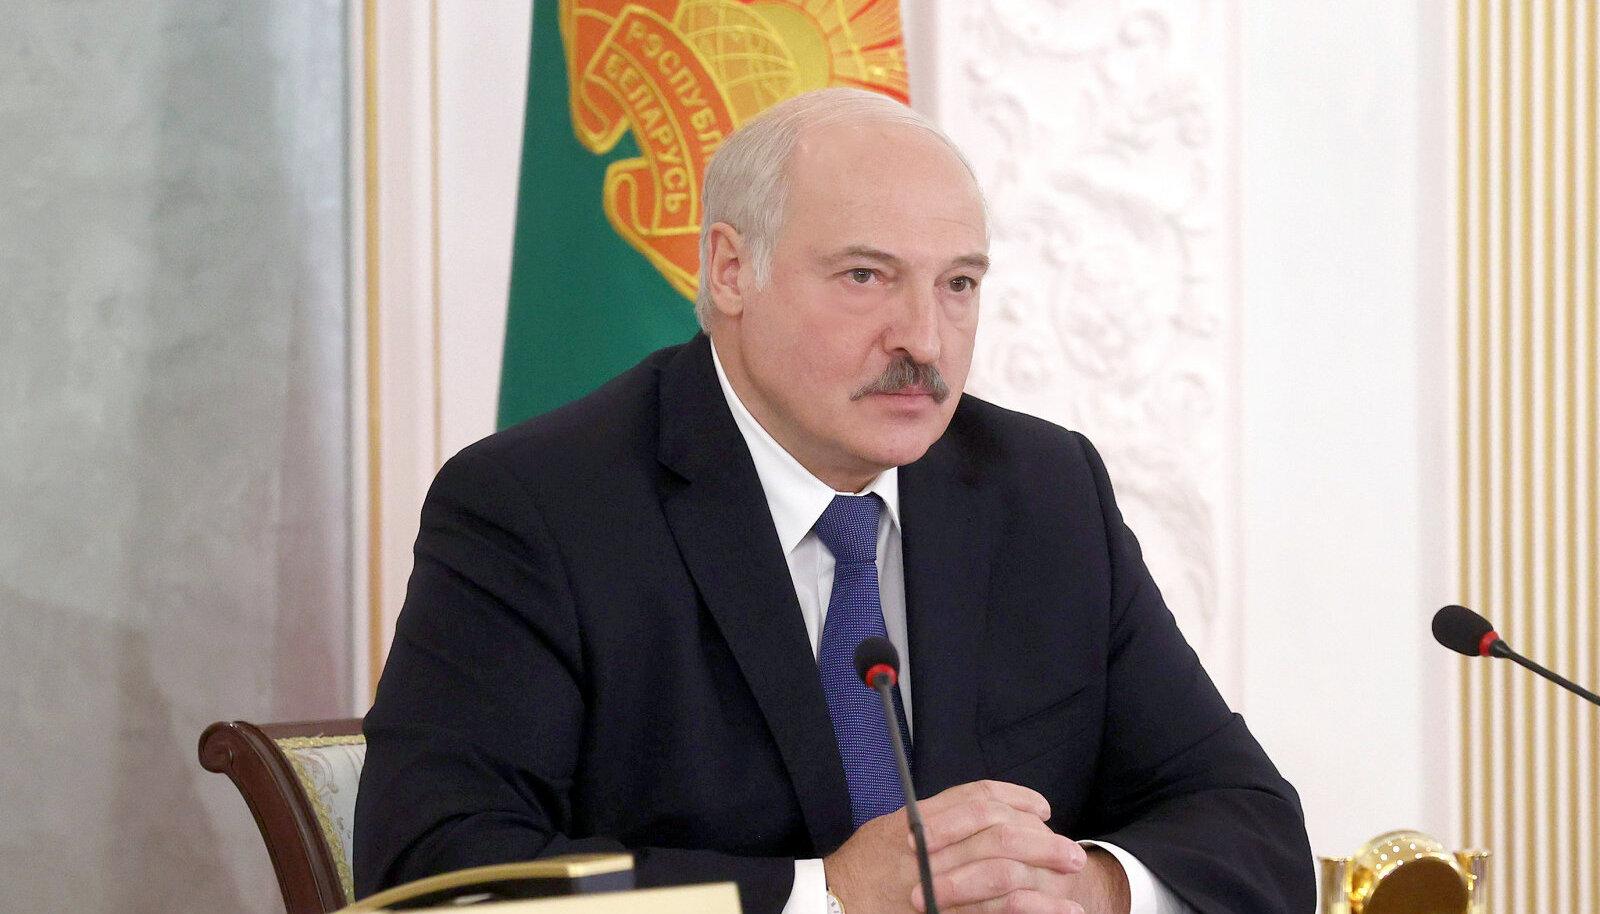 Valgevene riigipea Aleksandr Łukašenka.